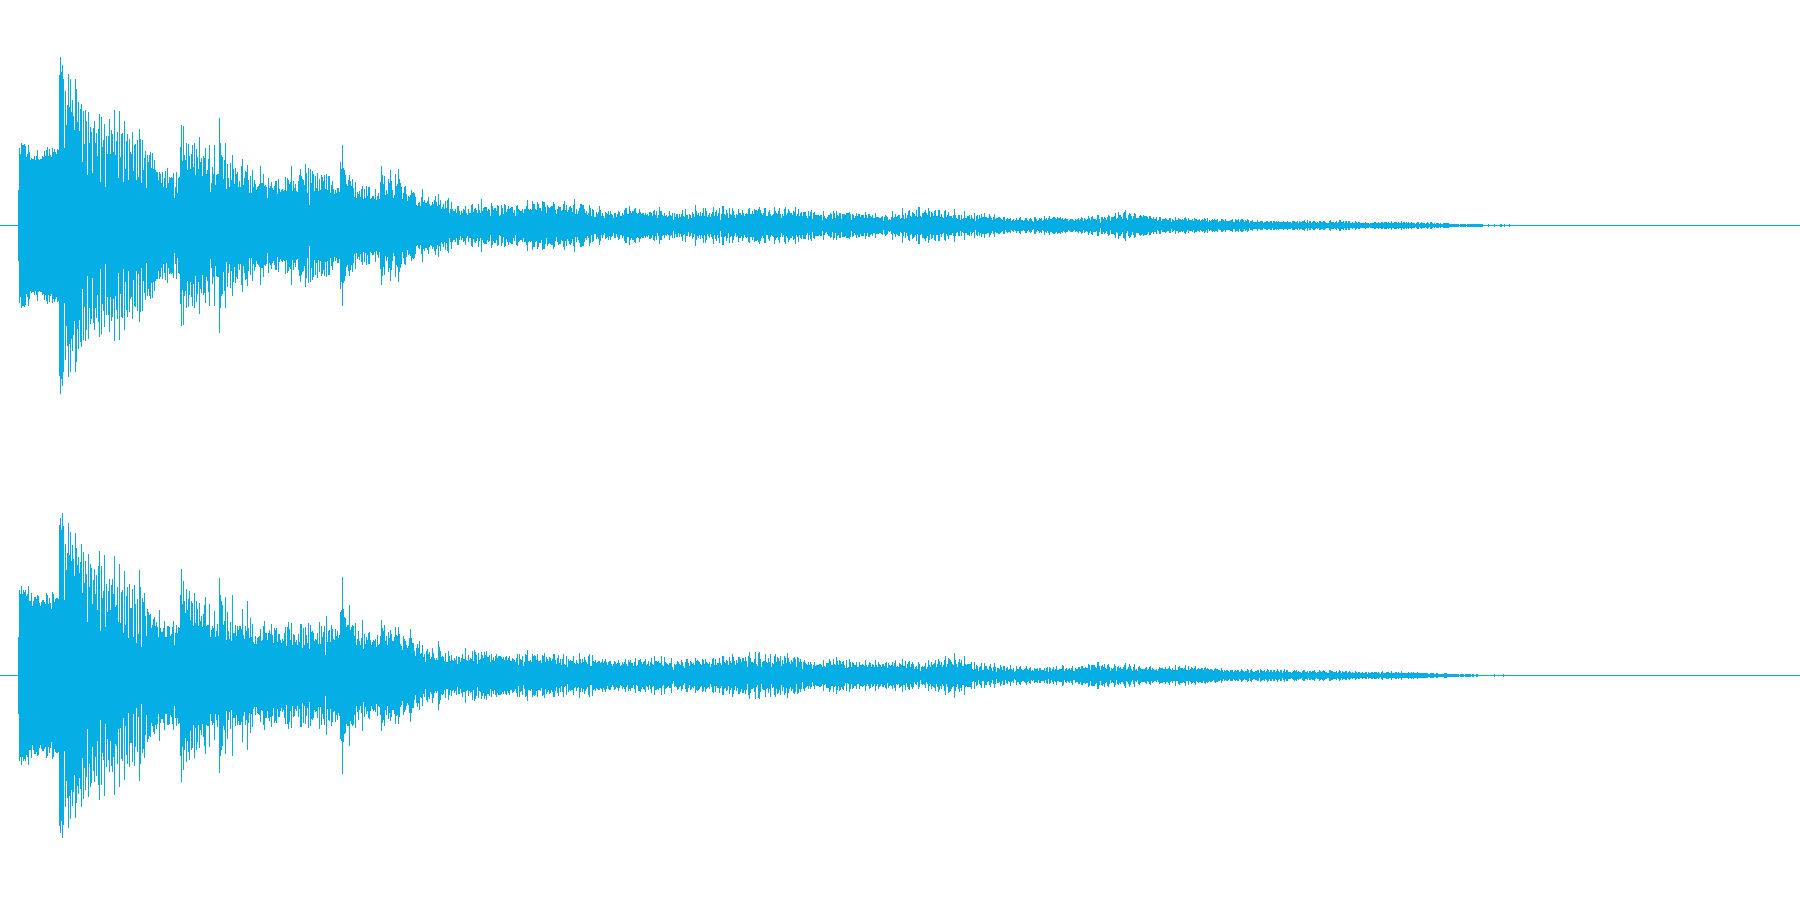 KANT近未来ジングル011041の再生済みの波形